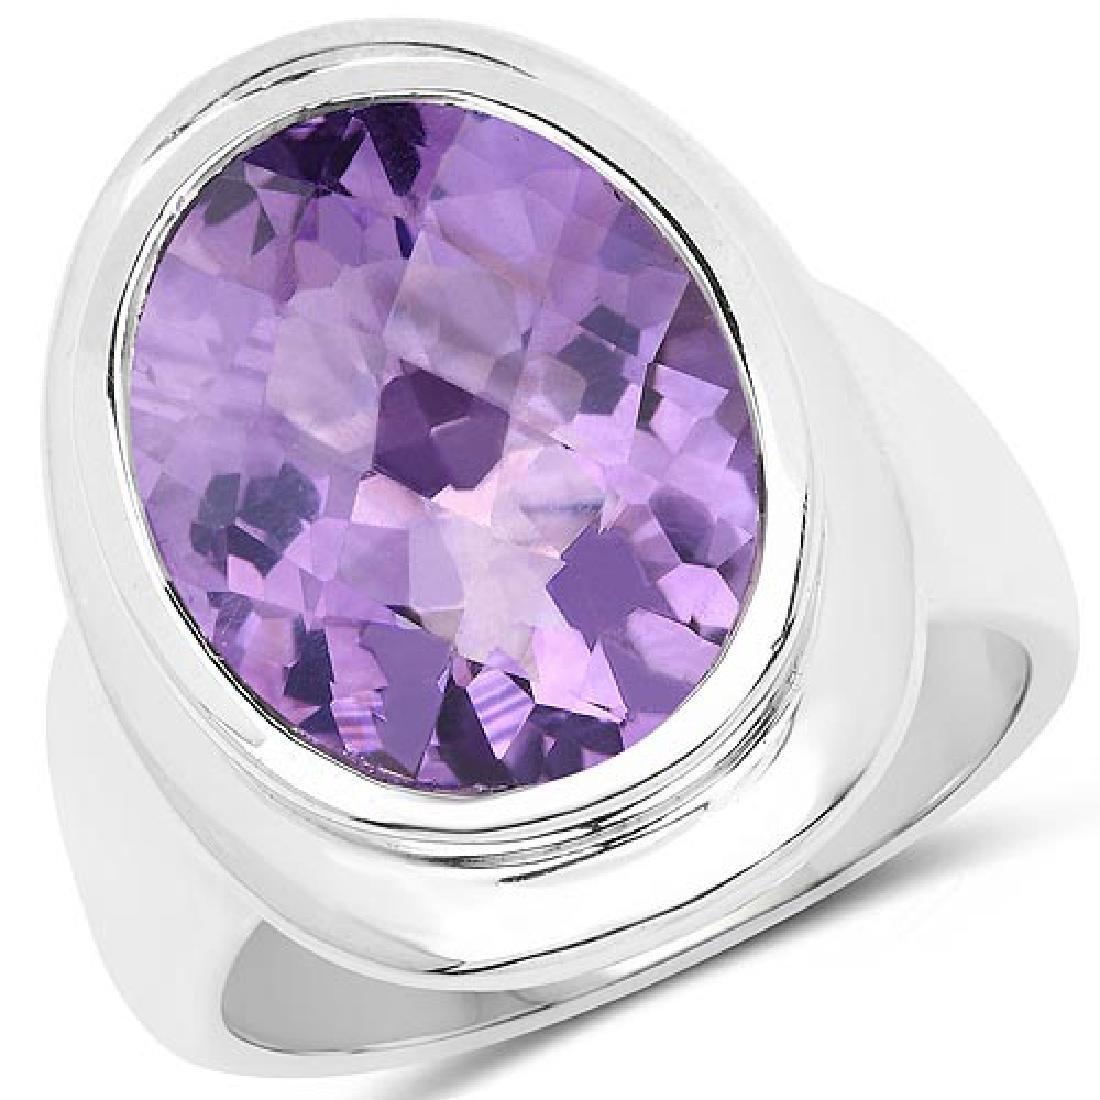 9.01 Carat Genuine Amethyst .925 Sterling Silver Ring